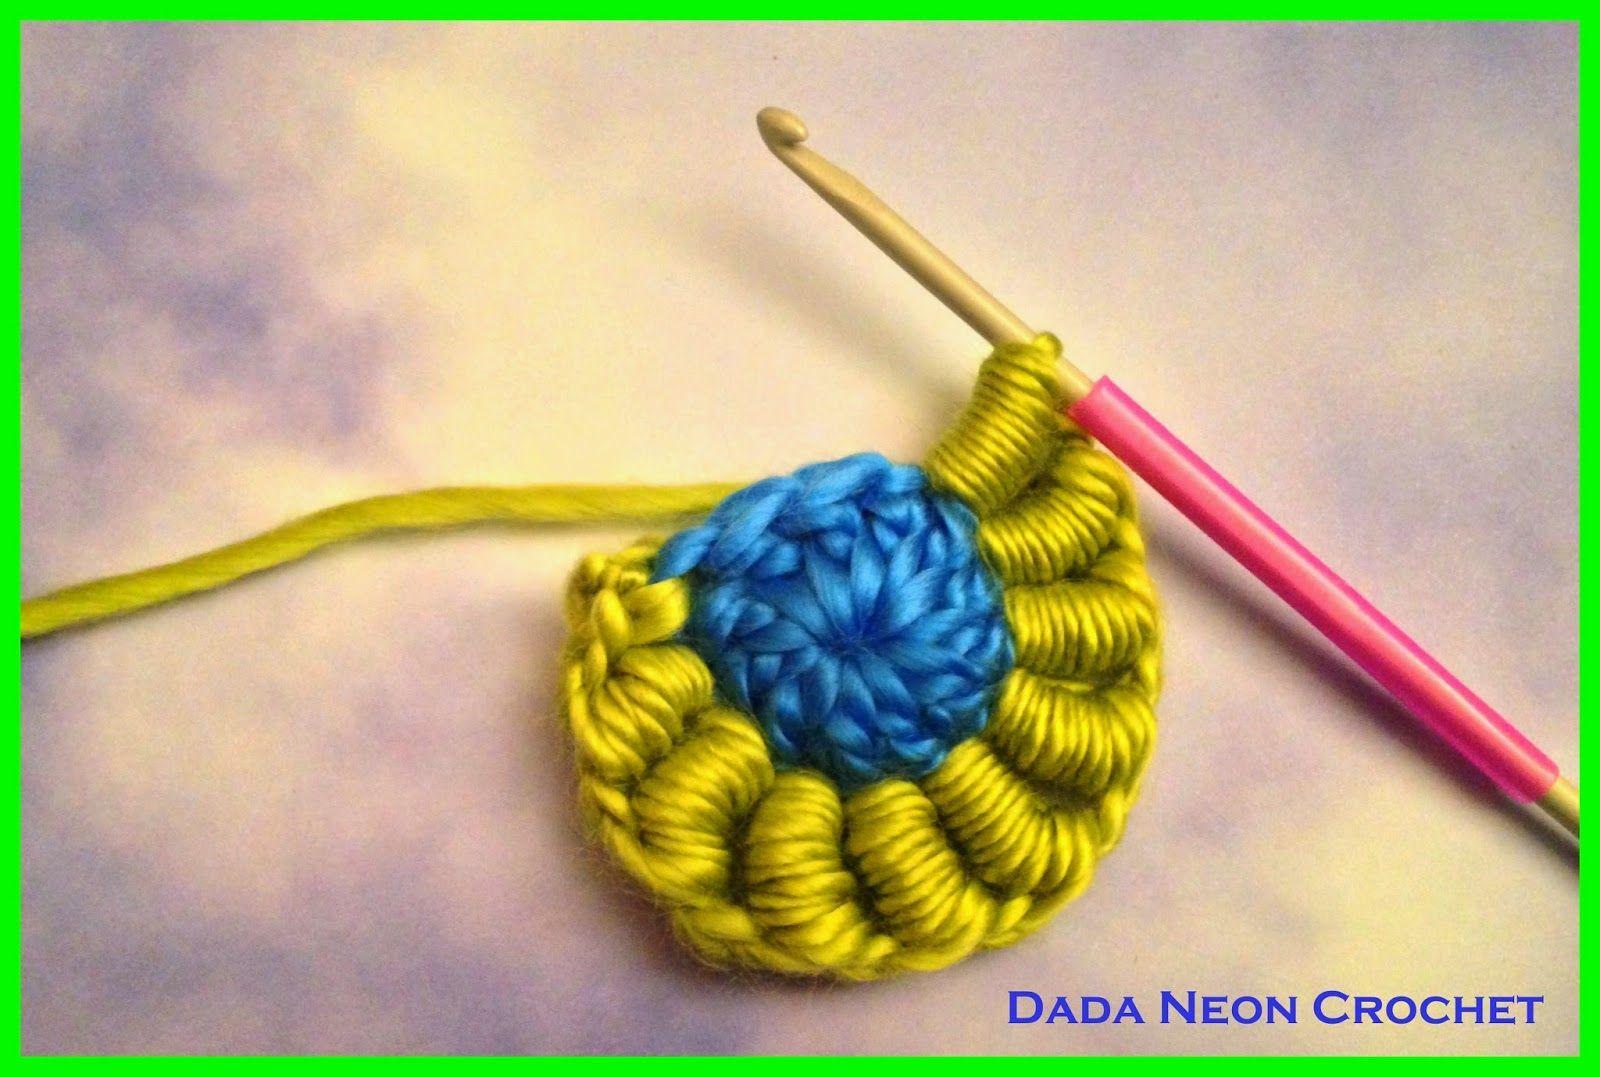 Dada Neon Crochet Bullion Stitch Tutorial My New Favourite